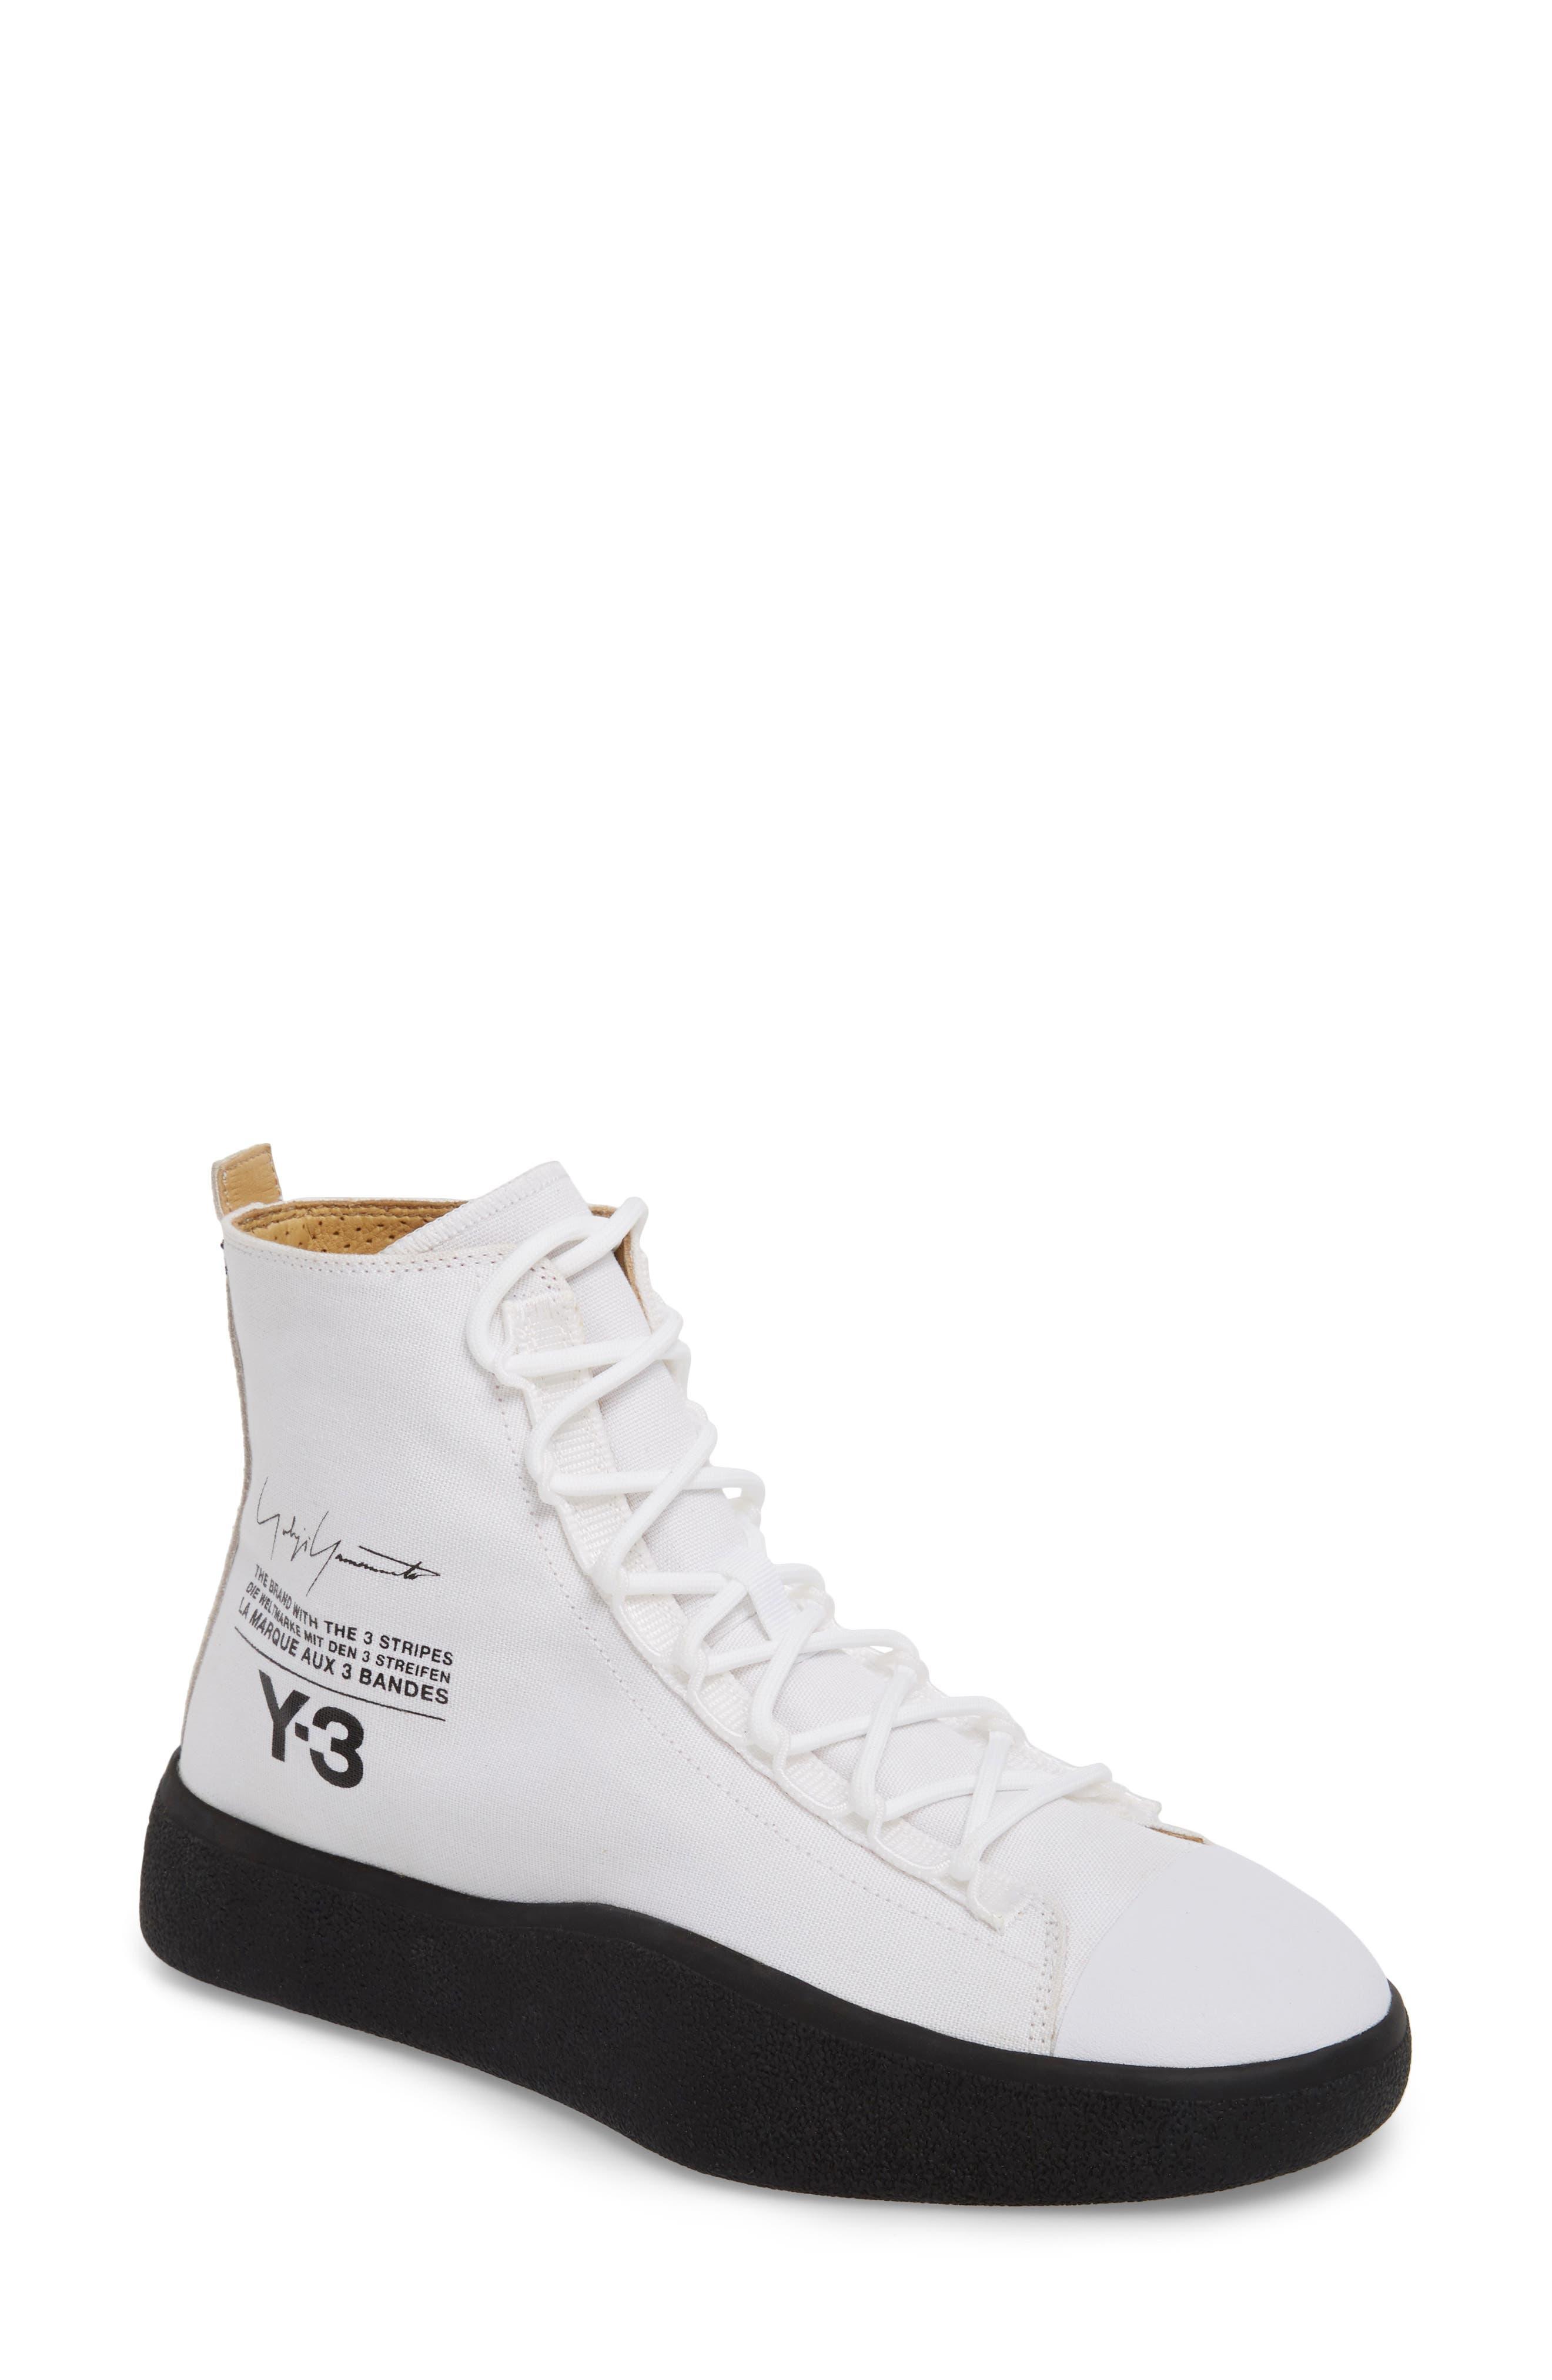 Bashyo High Top Sneaker,                         Main,                         color, White/ Black